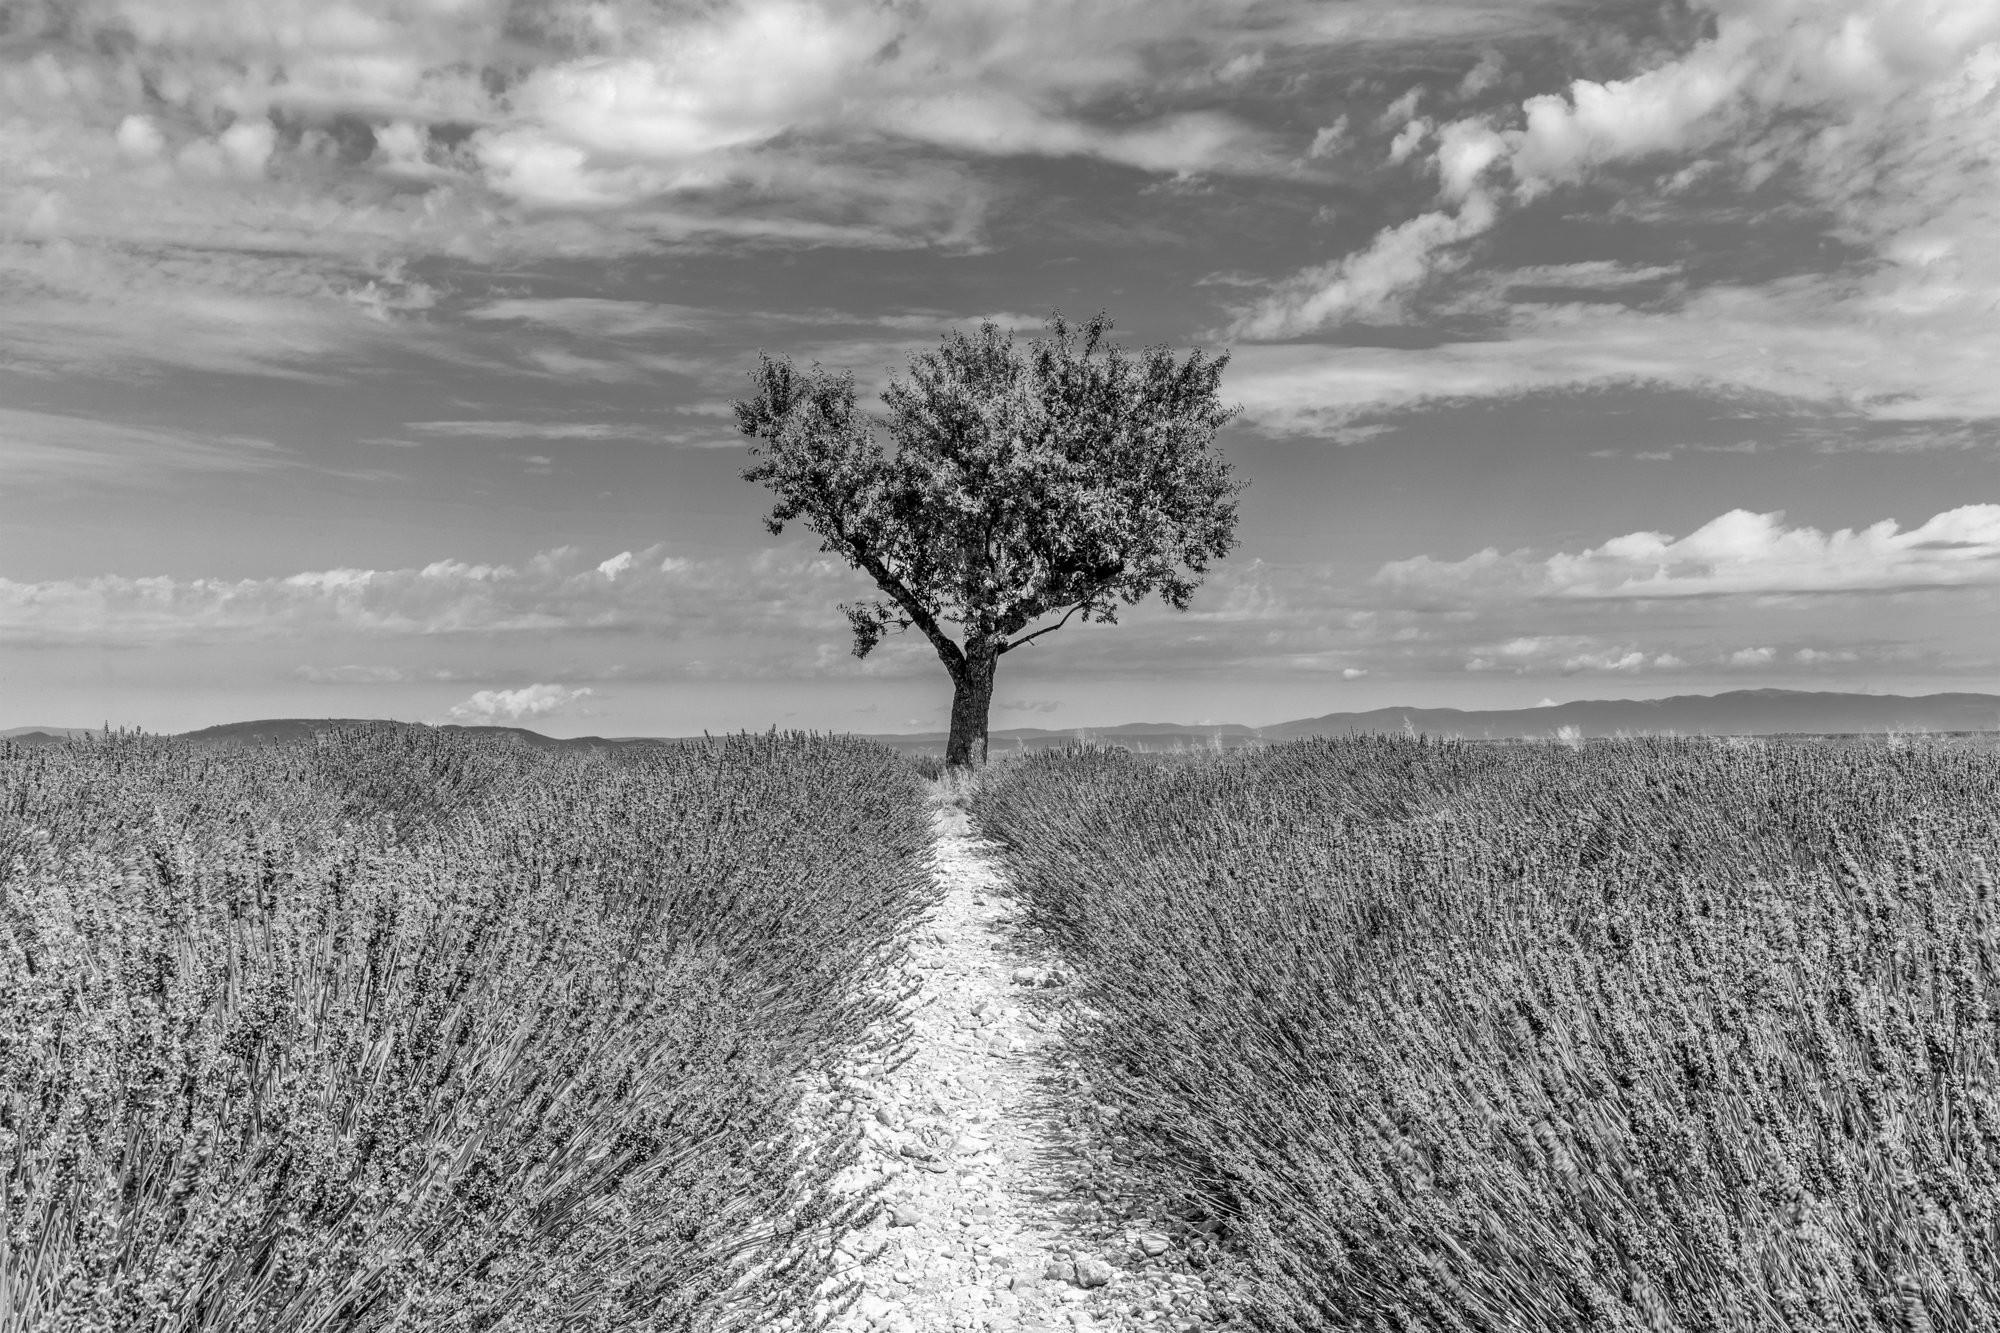 Tree in lavender field, Valensole, Haute-Provence France